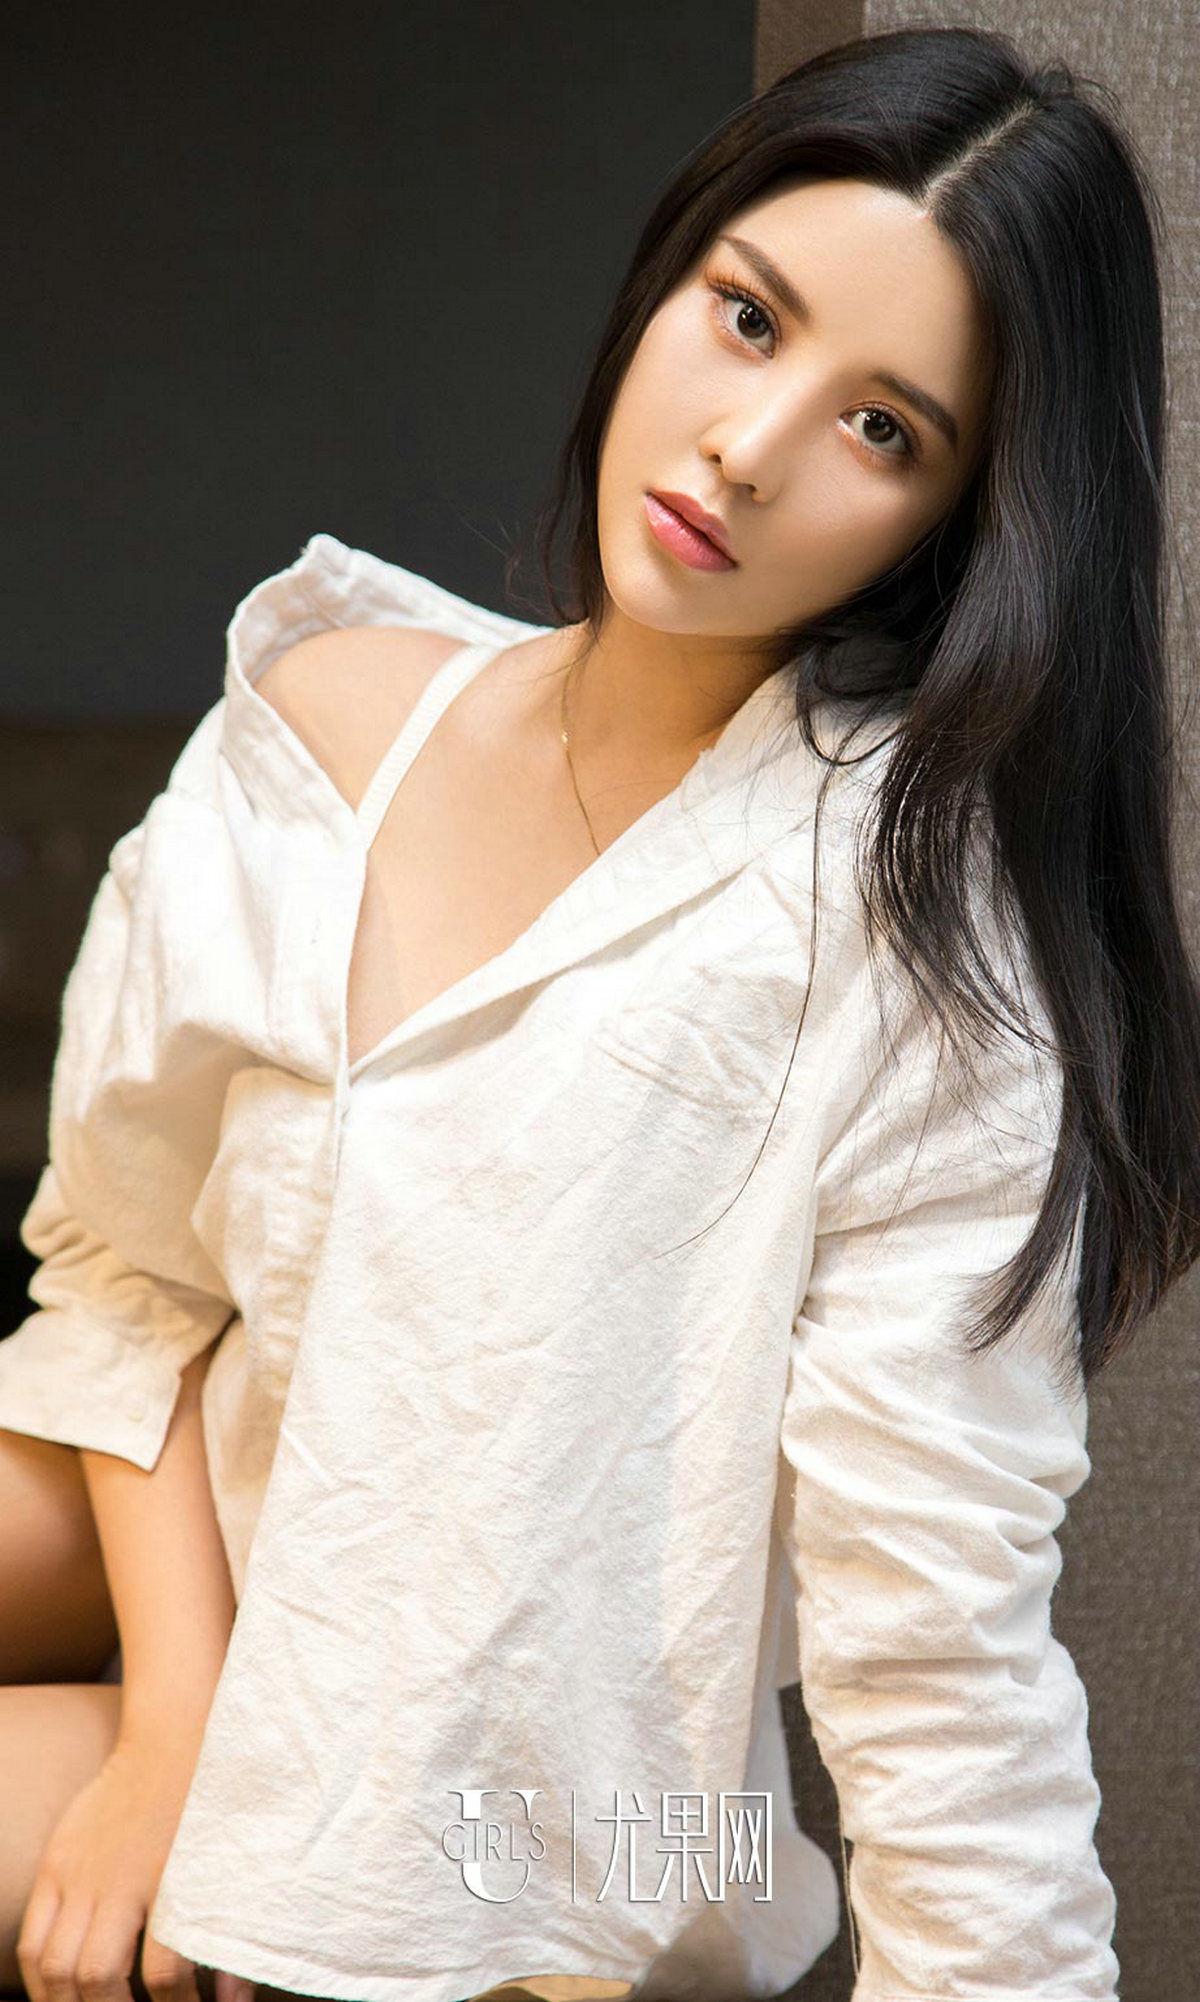 sukki可儿 - 黑裙与白衬衫